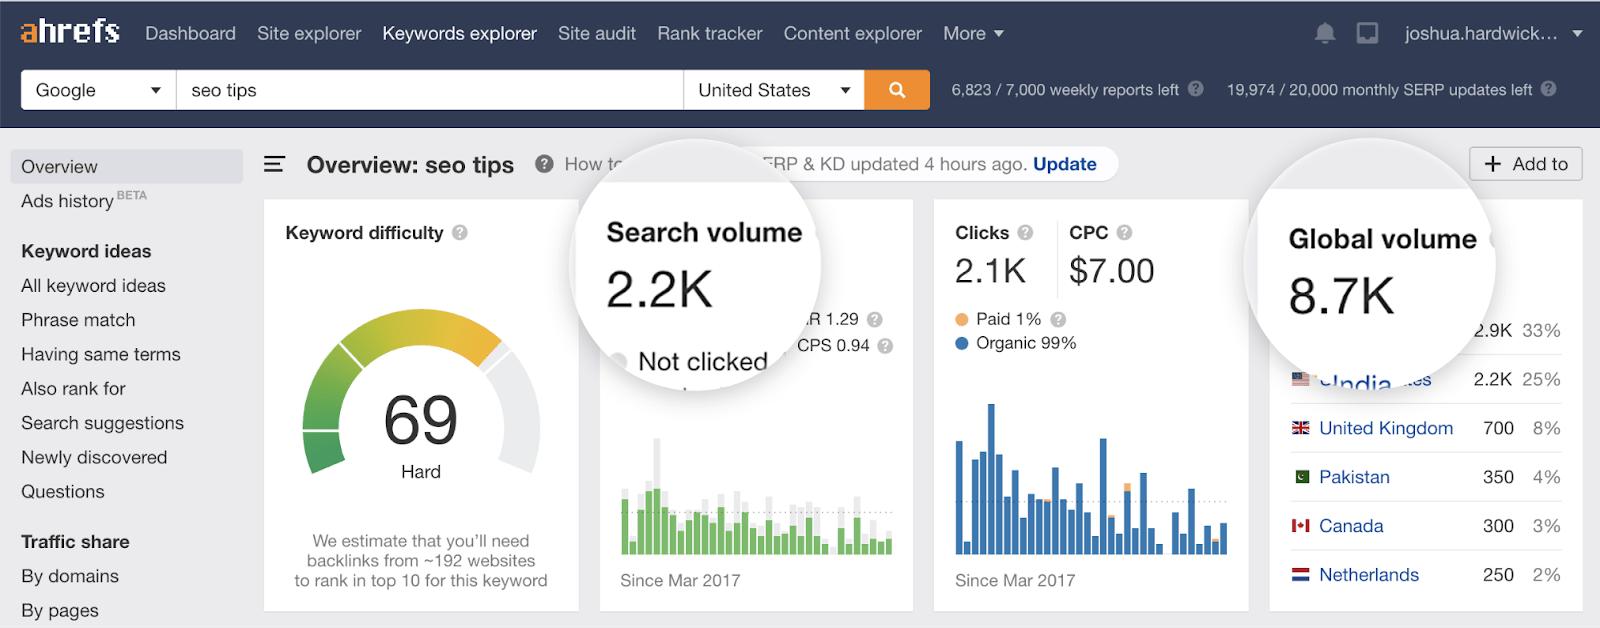 12 seo tips search volume